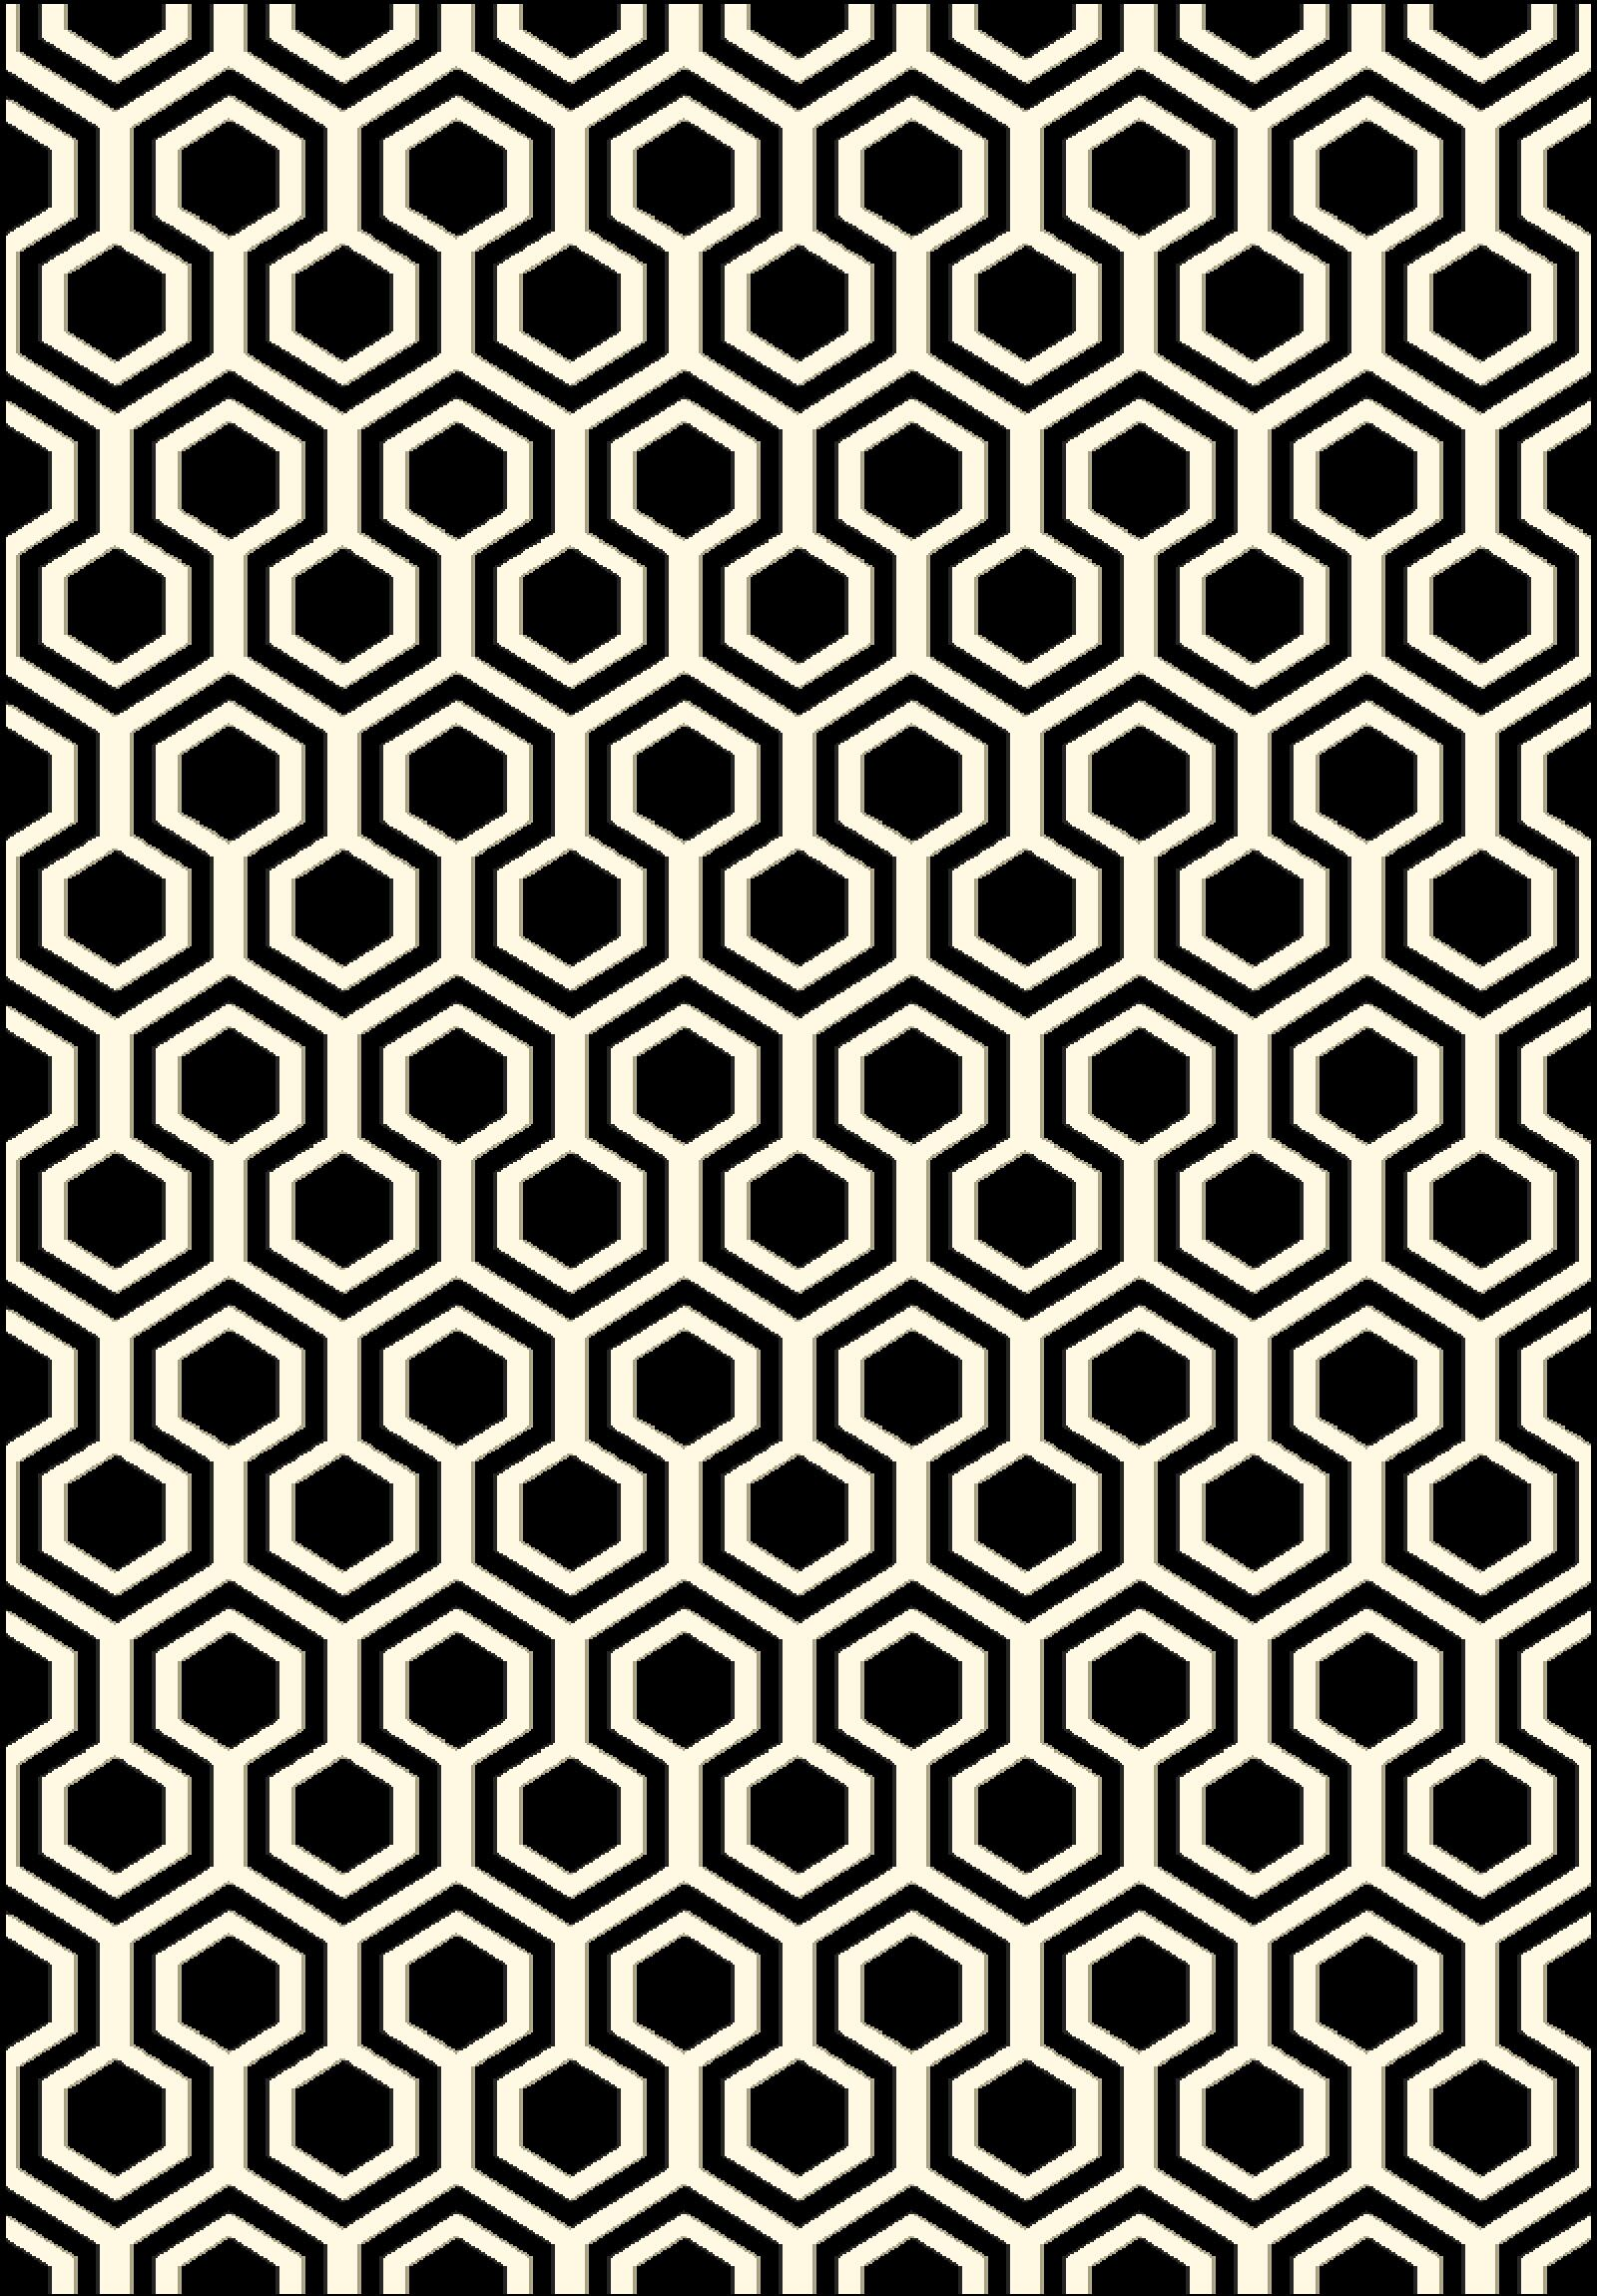 Trend Black Geometric Area Rug Rug Size: Rectangle 2' x 3'7